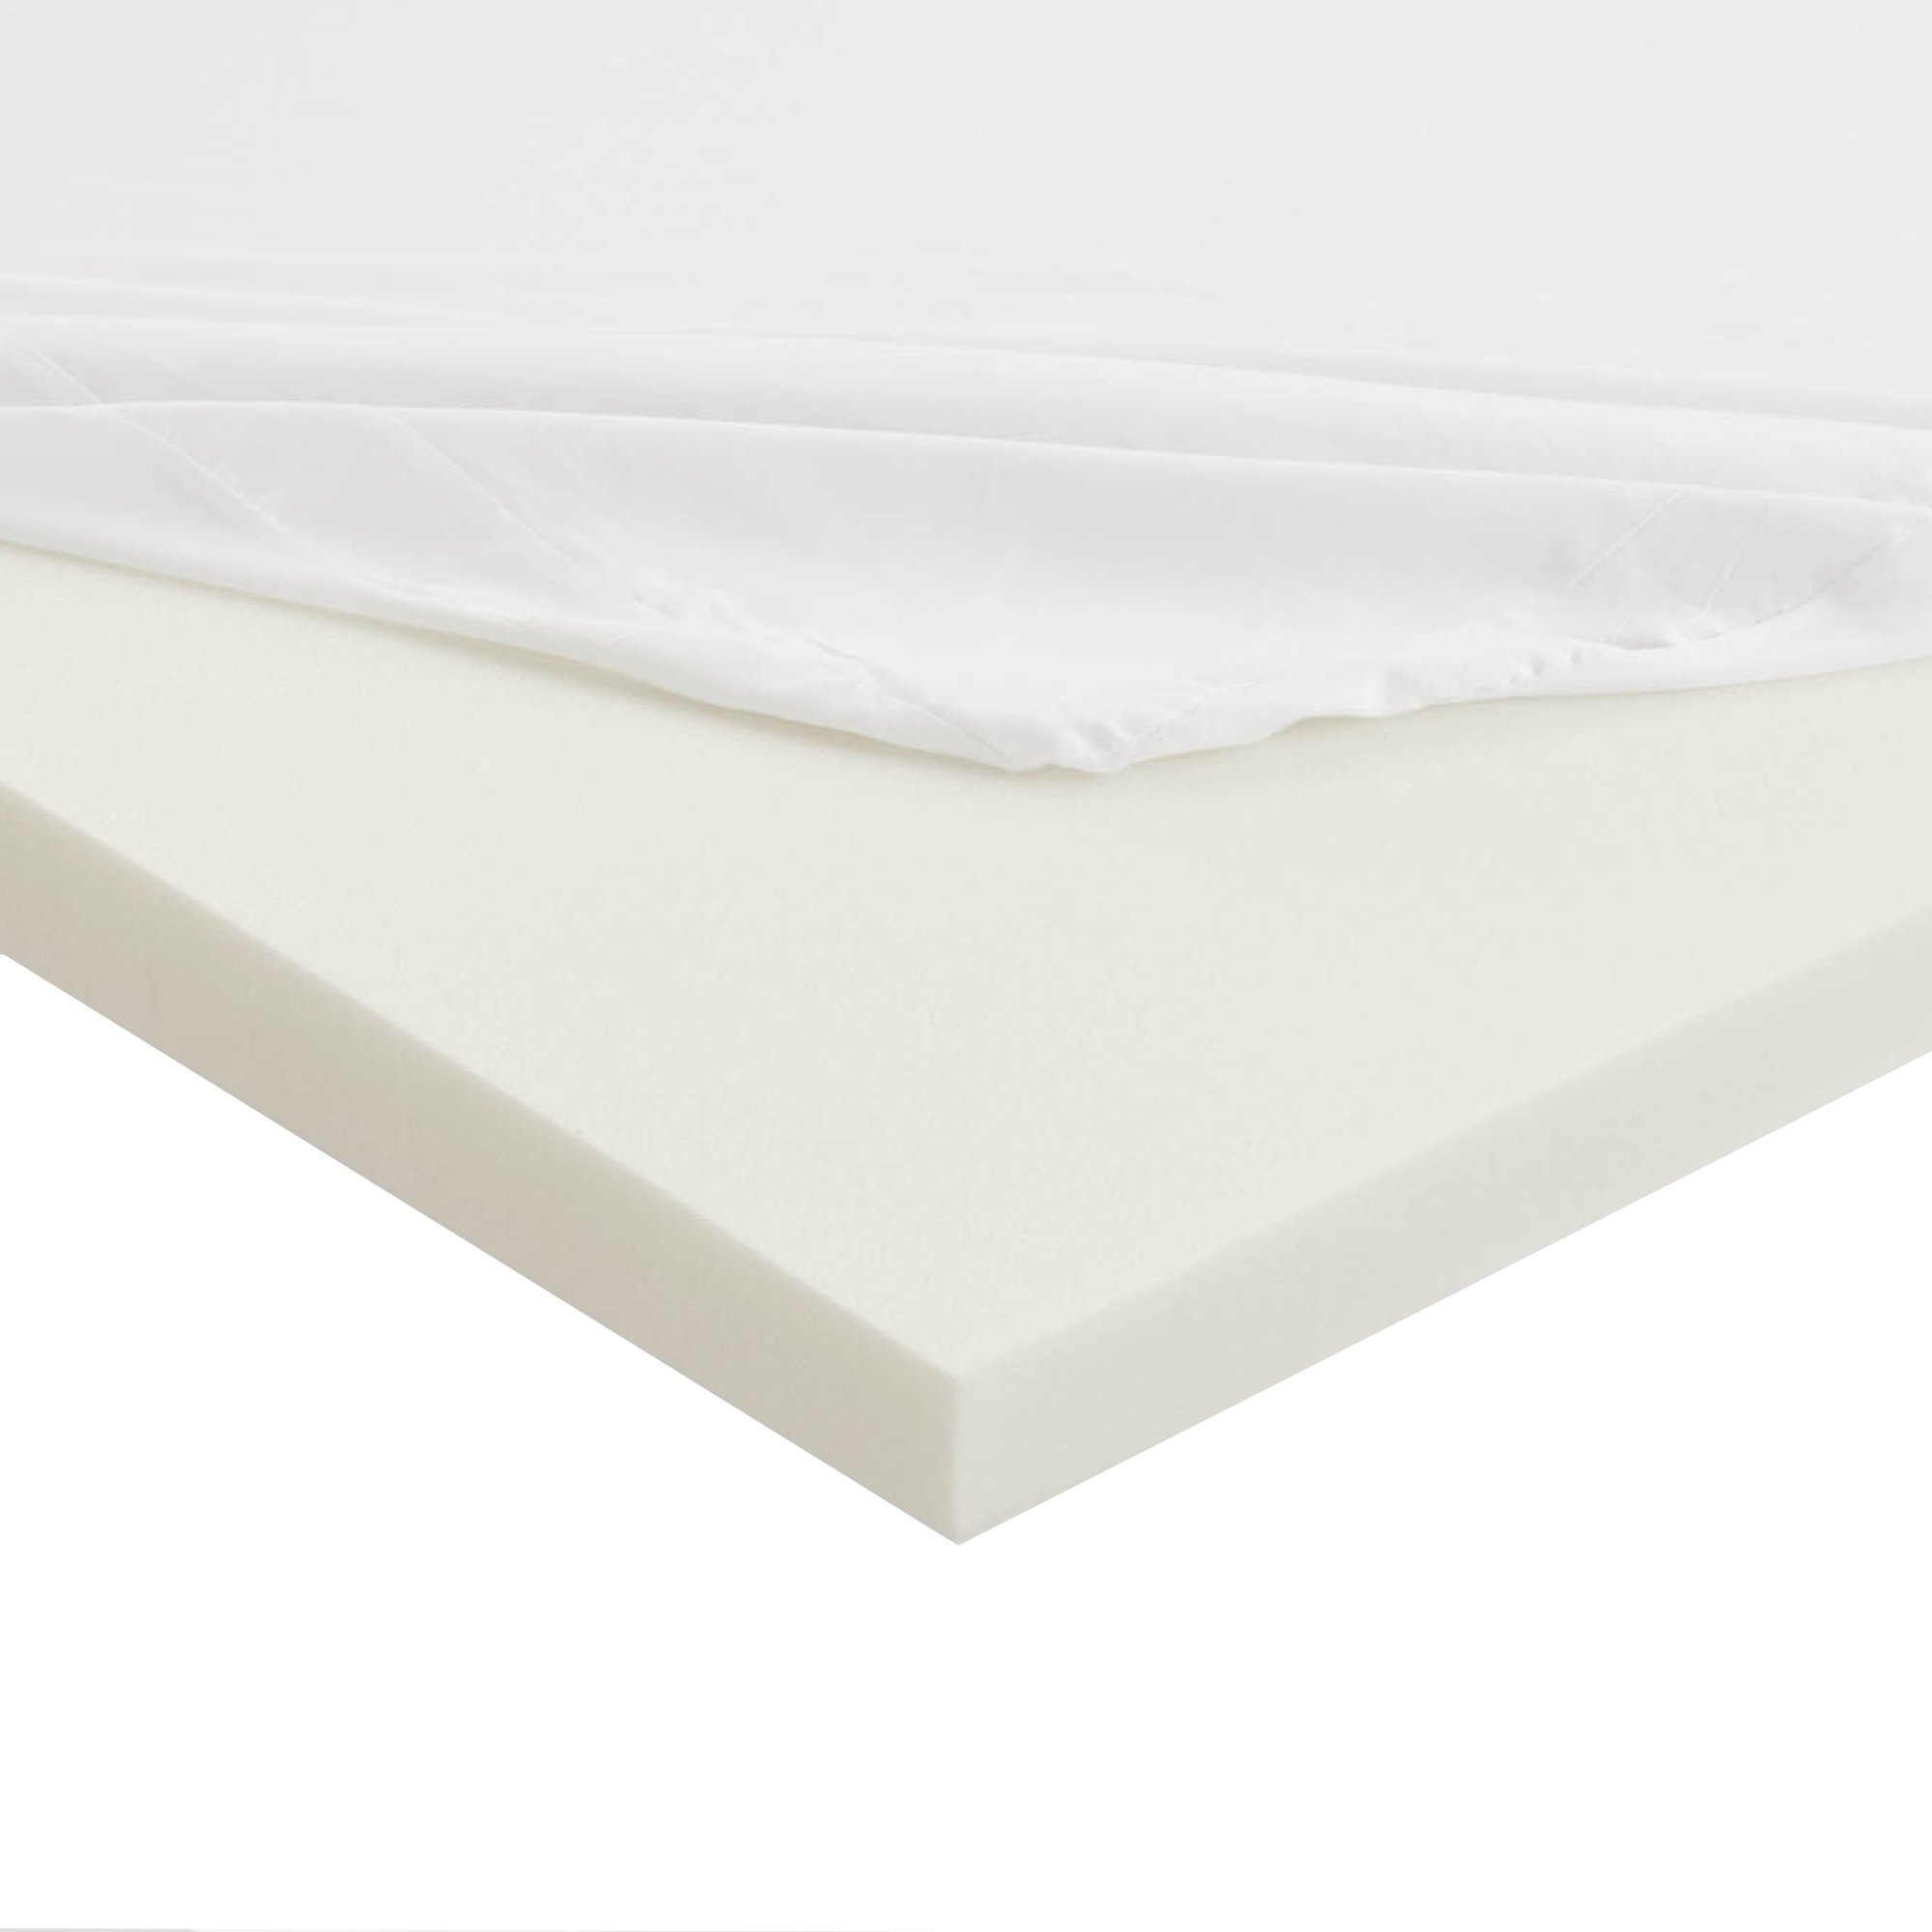 Sleep Innovations Anti-Allergy Memory Foam Mattress Topper, Twin